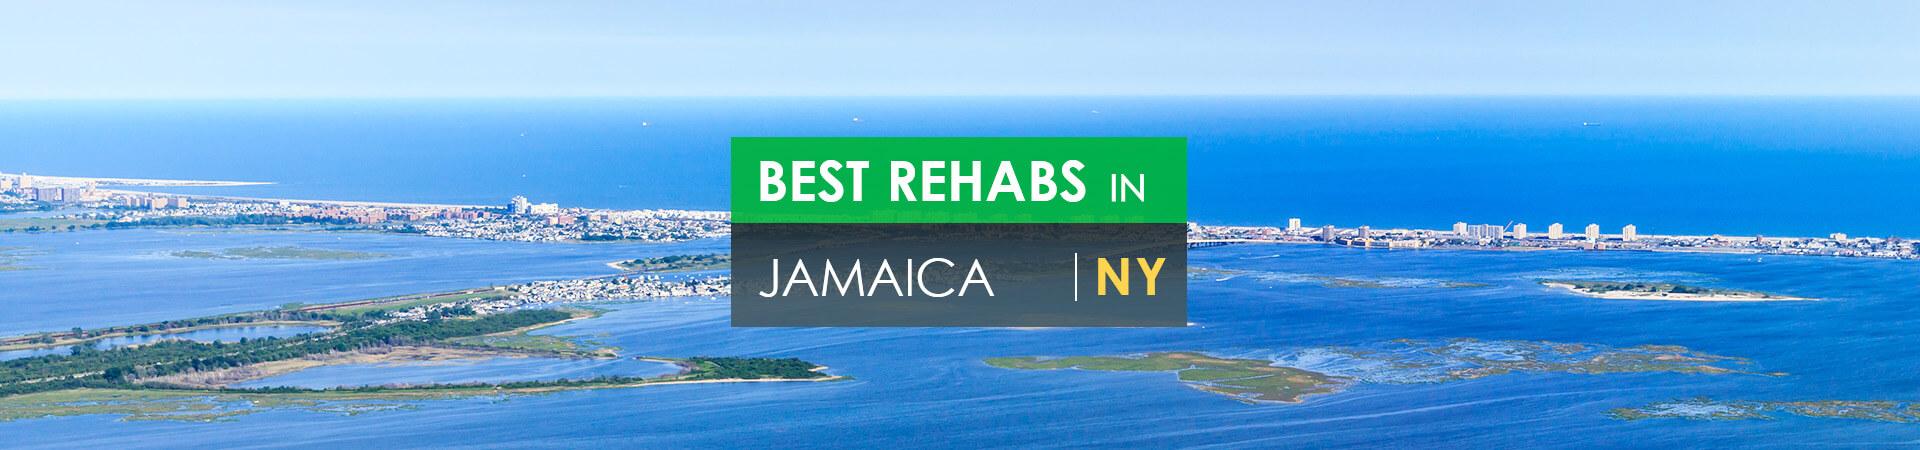 Best rehabs in Jamaica, NY